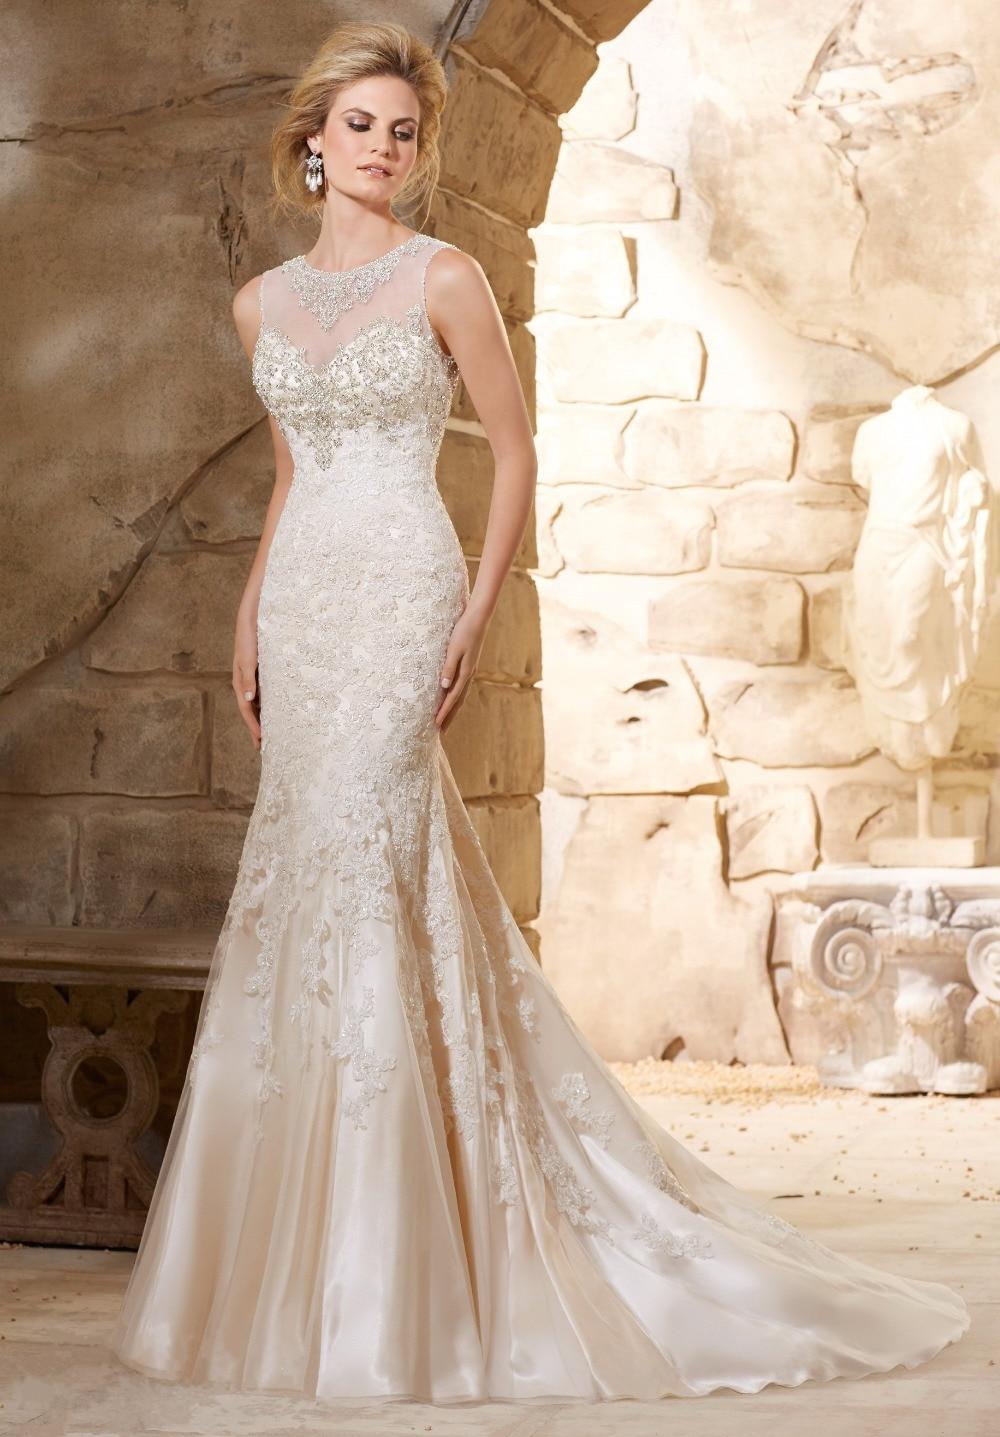 catherine deane feminine luxury wedding dresses luxury wedding dresses Cathrine Deane Uniquely Feminine Luxury Wedding Dresses Bridal Fashion Fashion Beauty Get